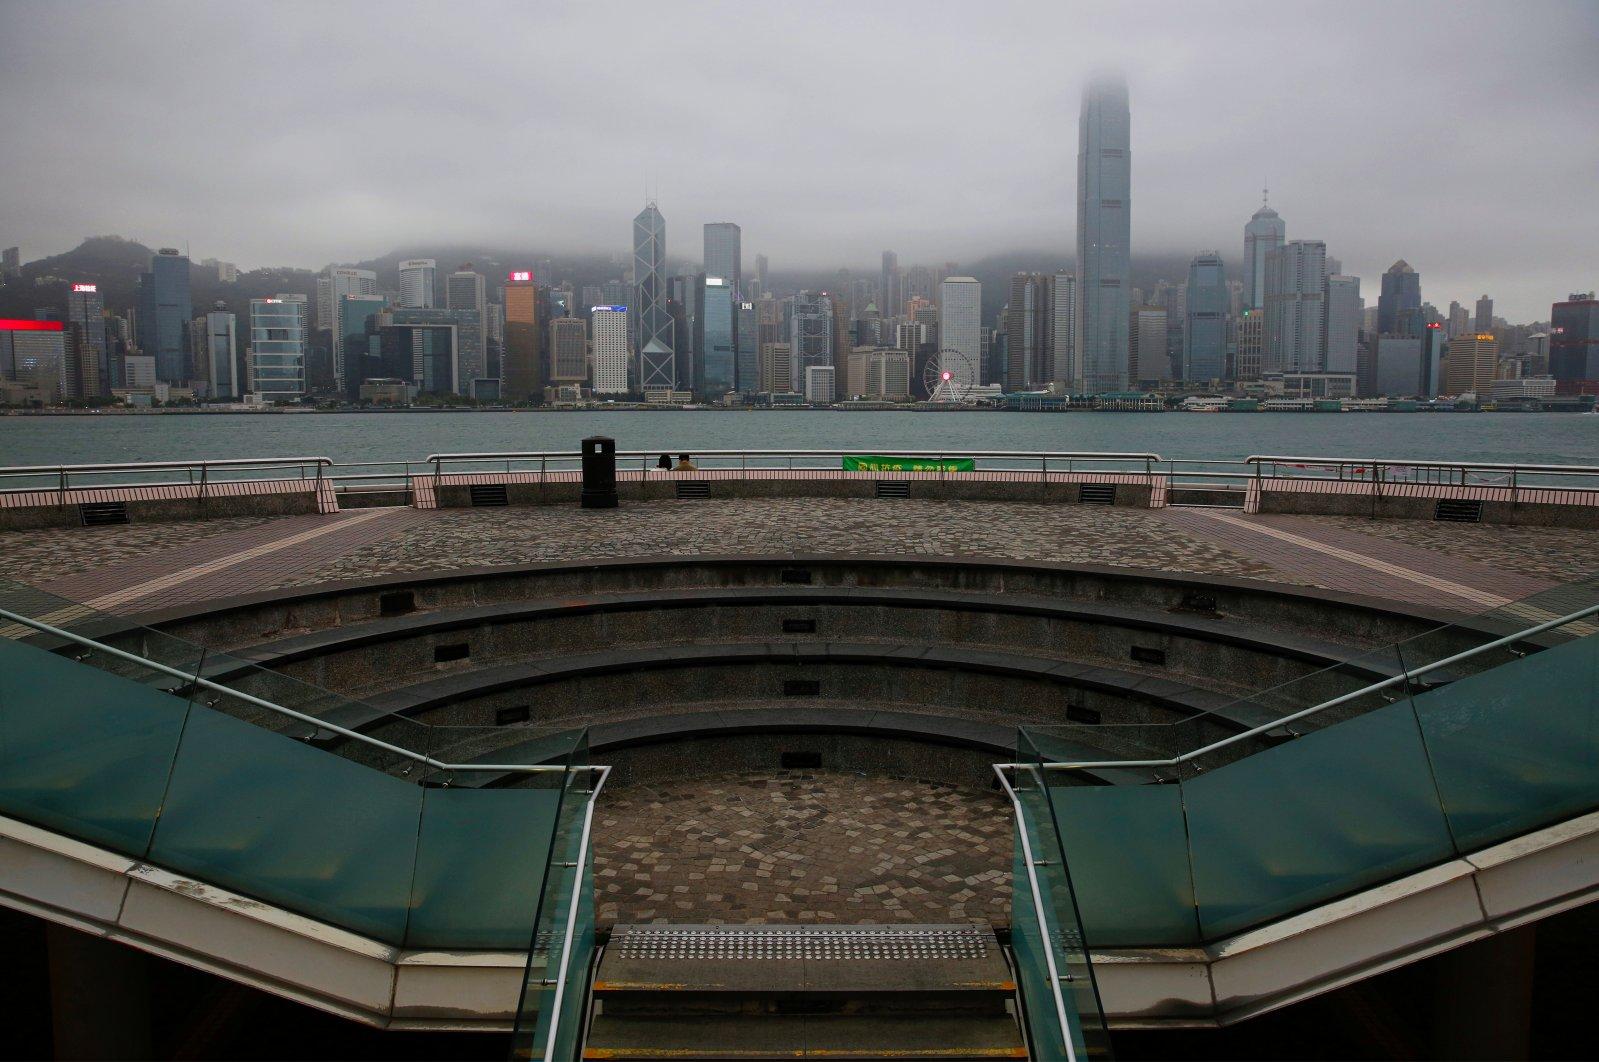 A general view of a tourist attraction at Tsim Sha Tsui, following the novel coronavirus outbreak, in Hong Kong, China, April 2, 2020. (Reuters Photo)